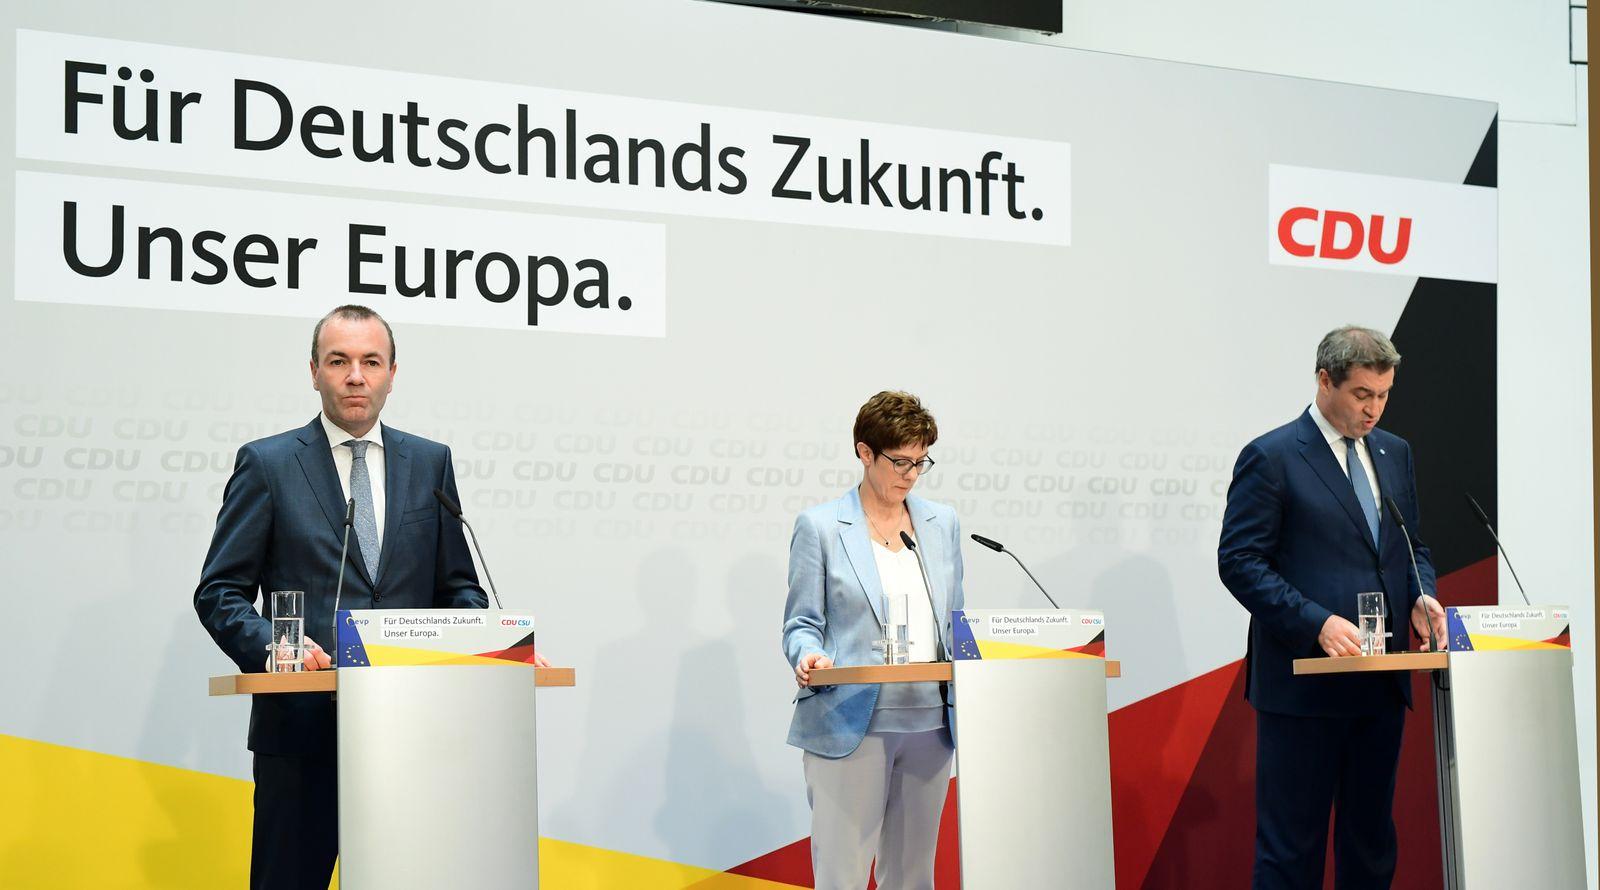 Europawahl/ CDU/ AKK/ Söder